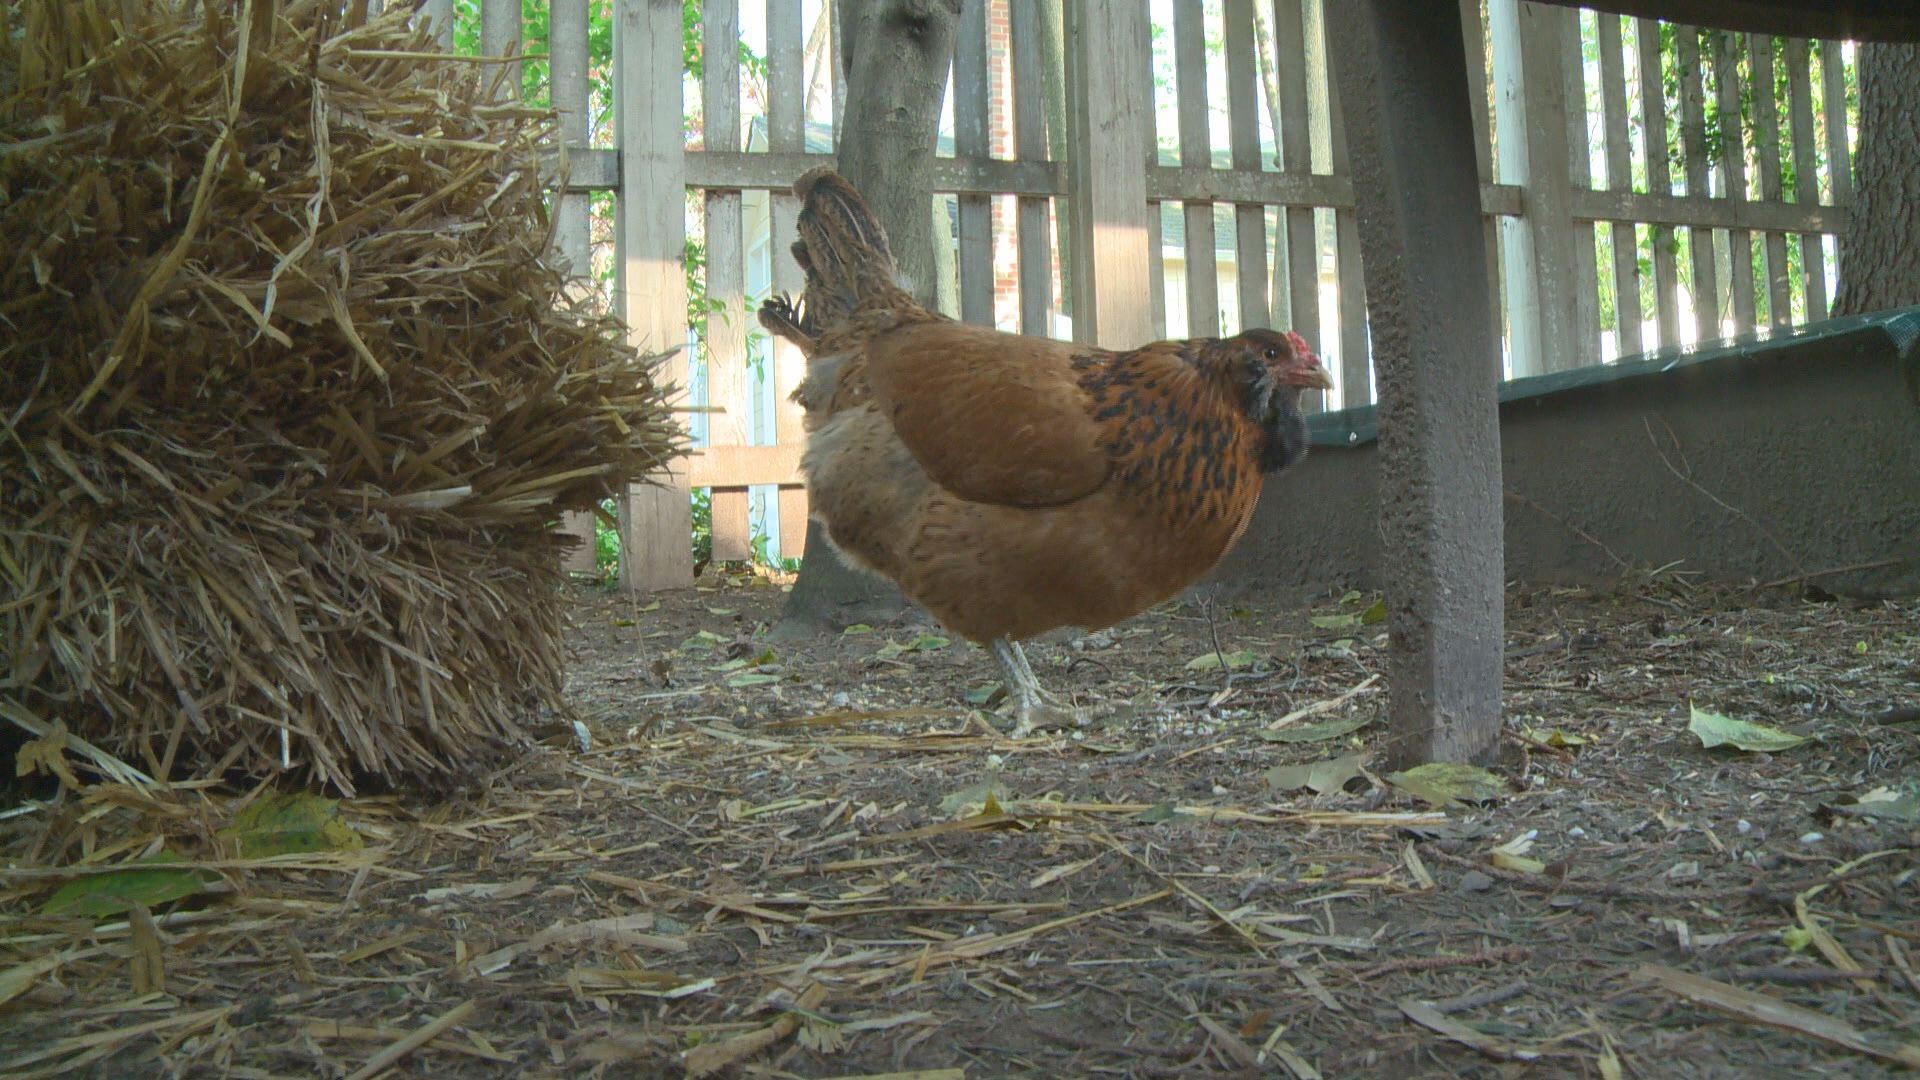 dc mayor wants to ban backyard chickens wusa9 com